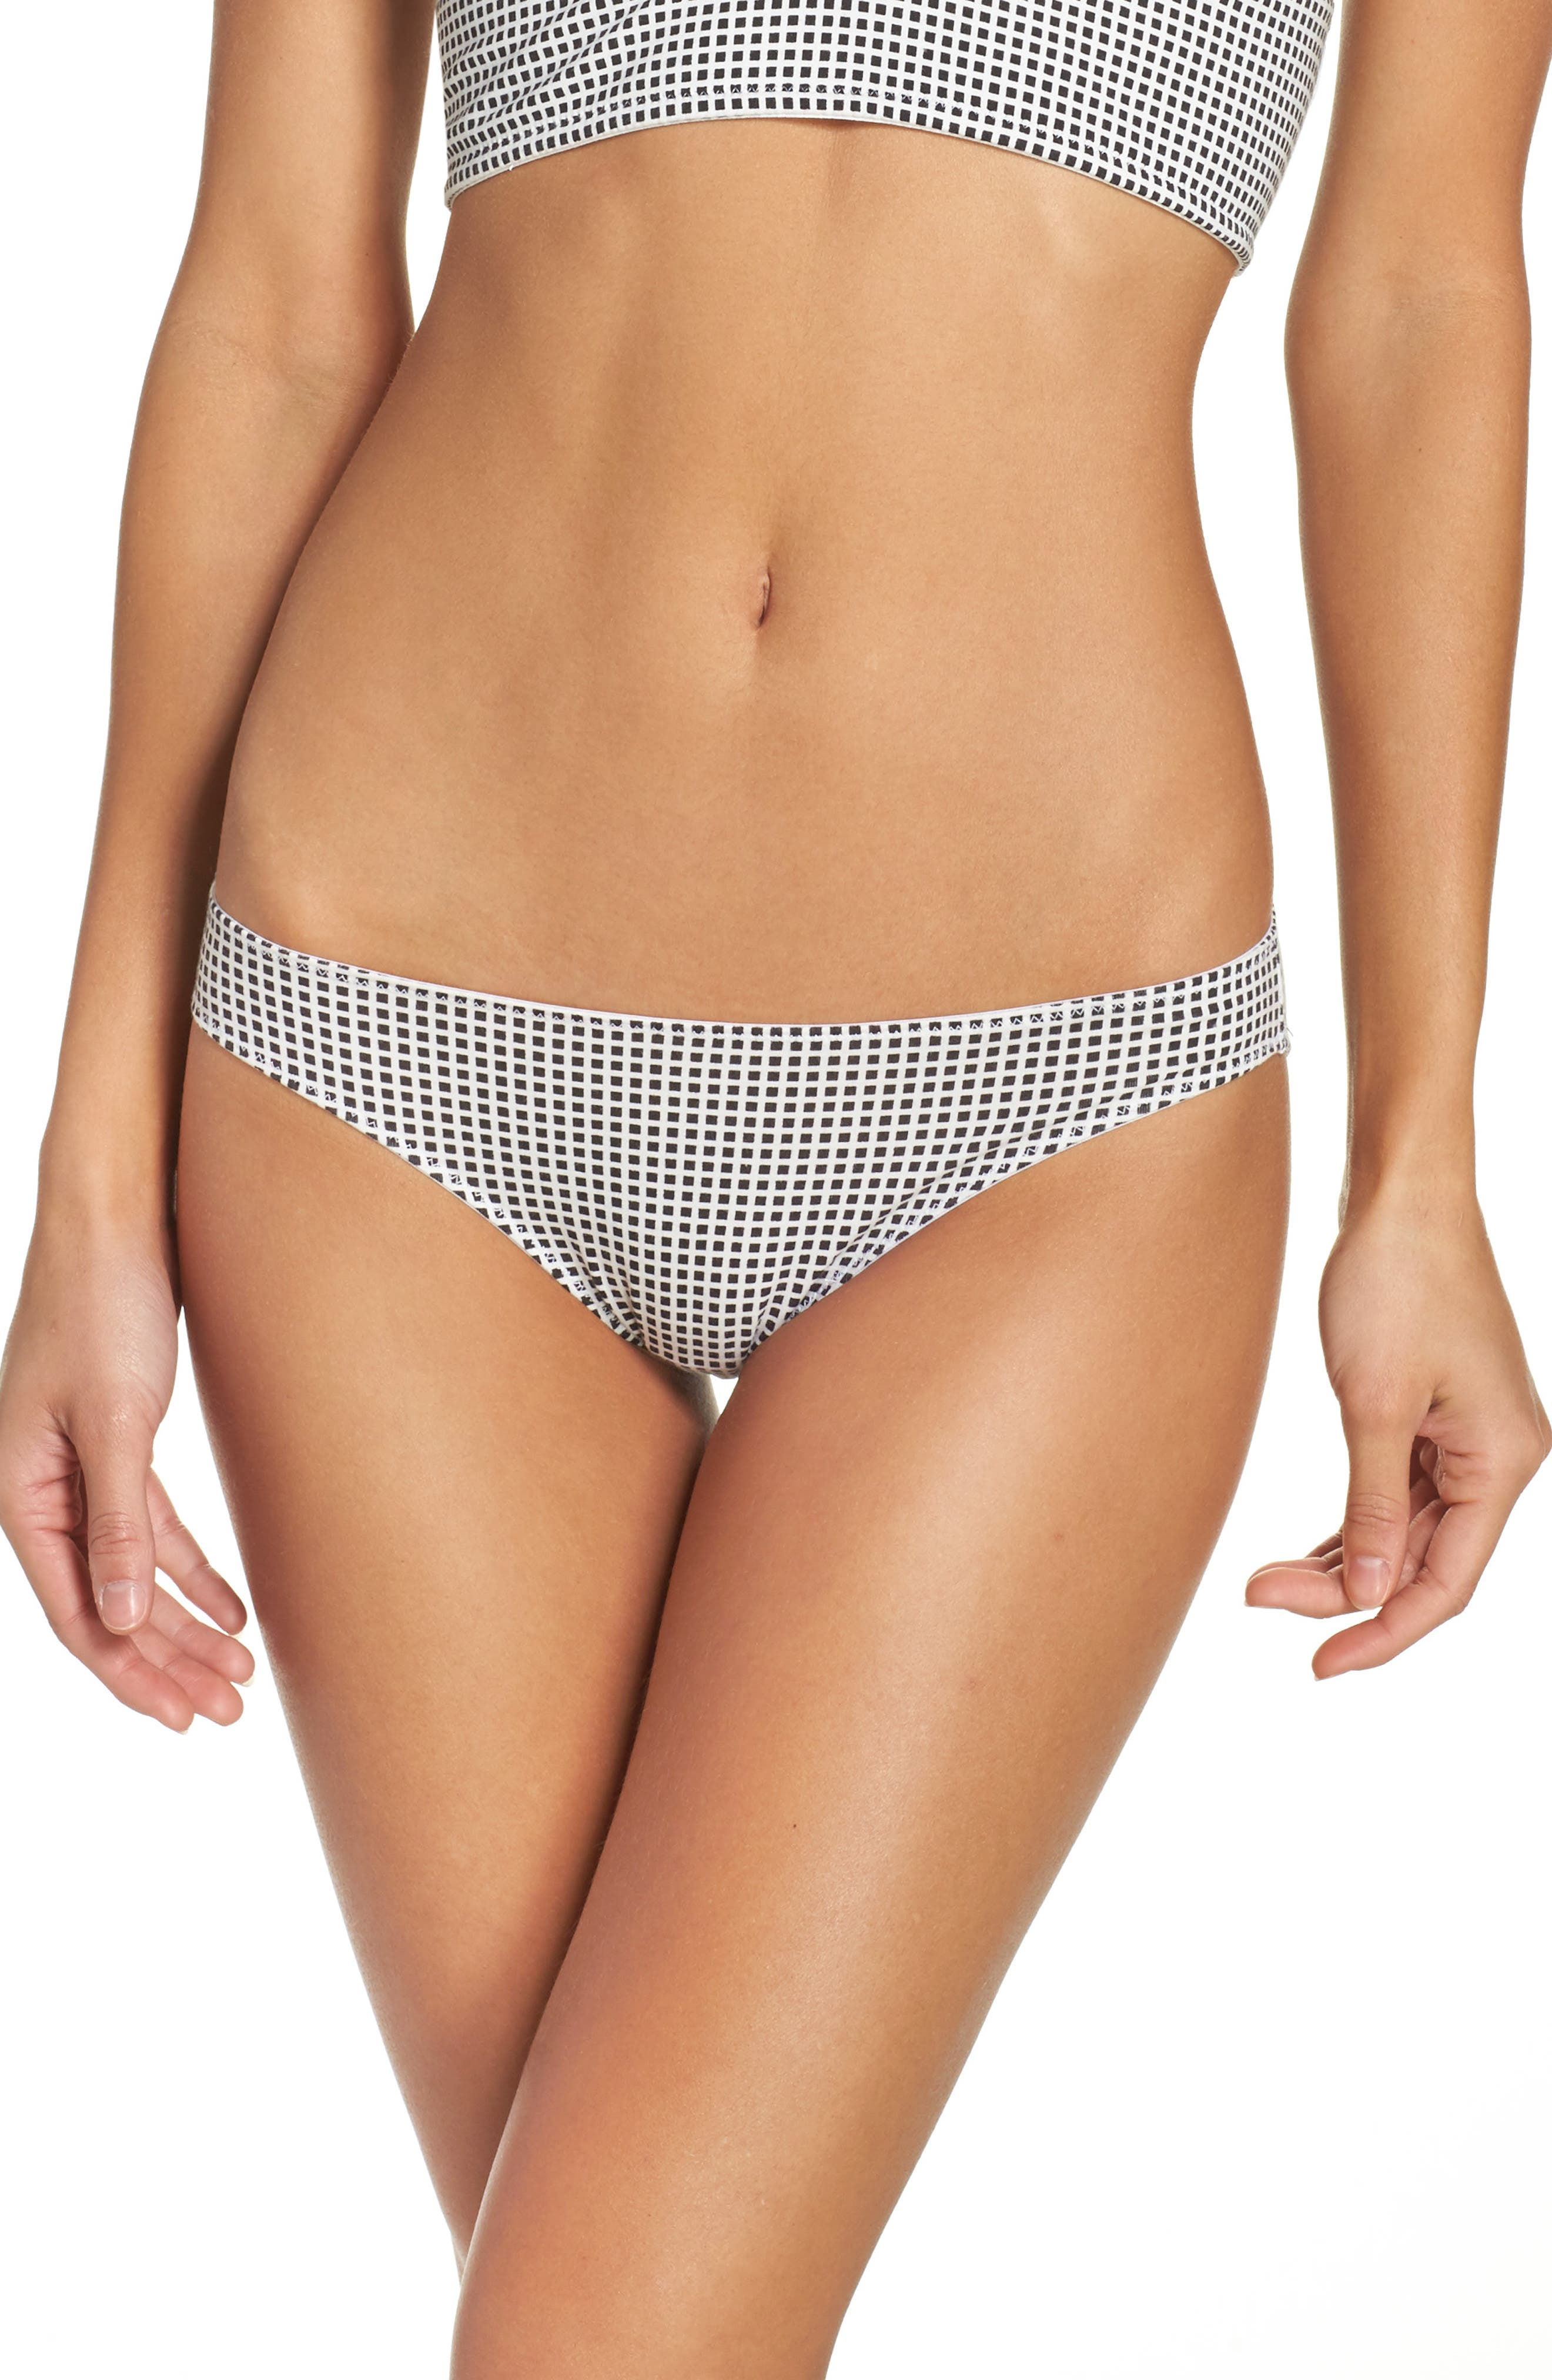 Jersey Bikini,                             Main thumbnail 1, color,                             002